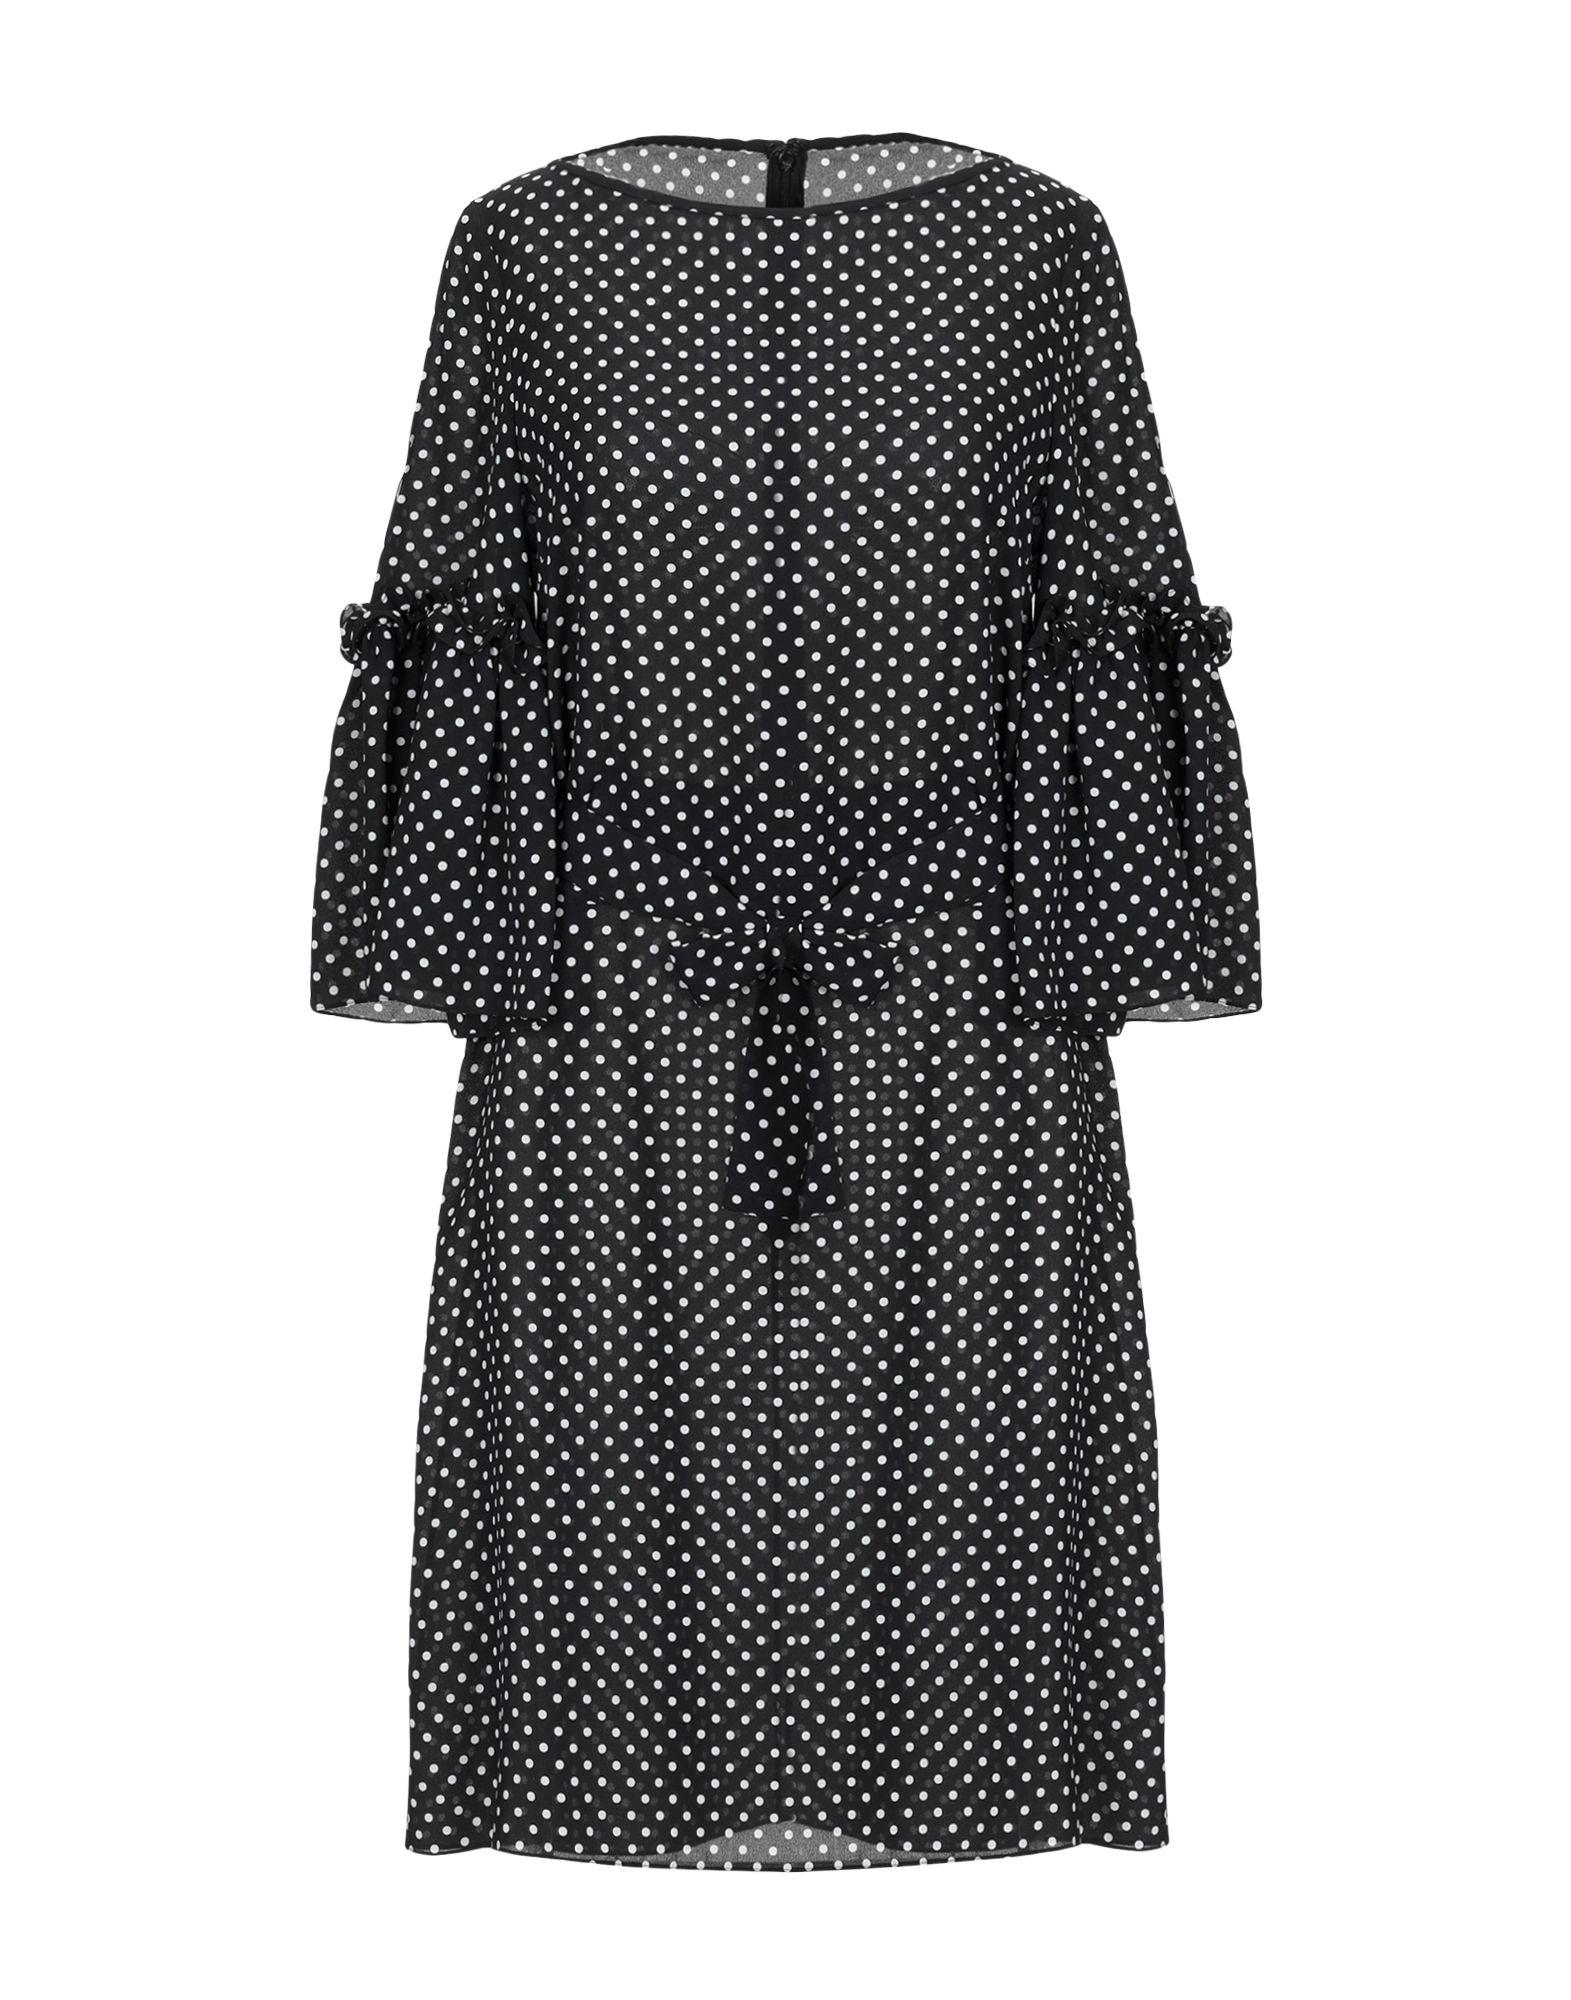 Фото - MICHAEL KORS COLLECTION Короткое платье michael kors collection короткое платье